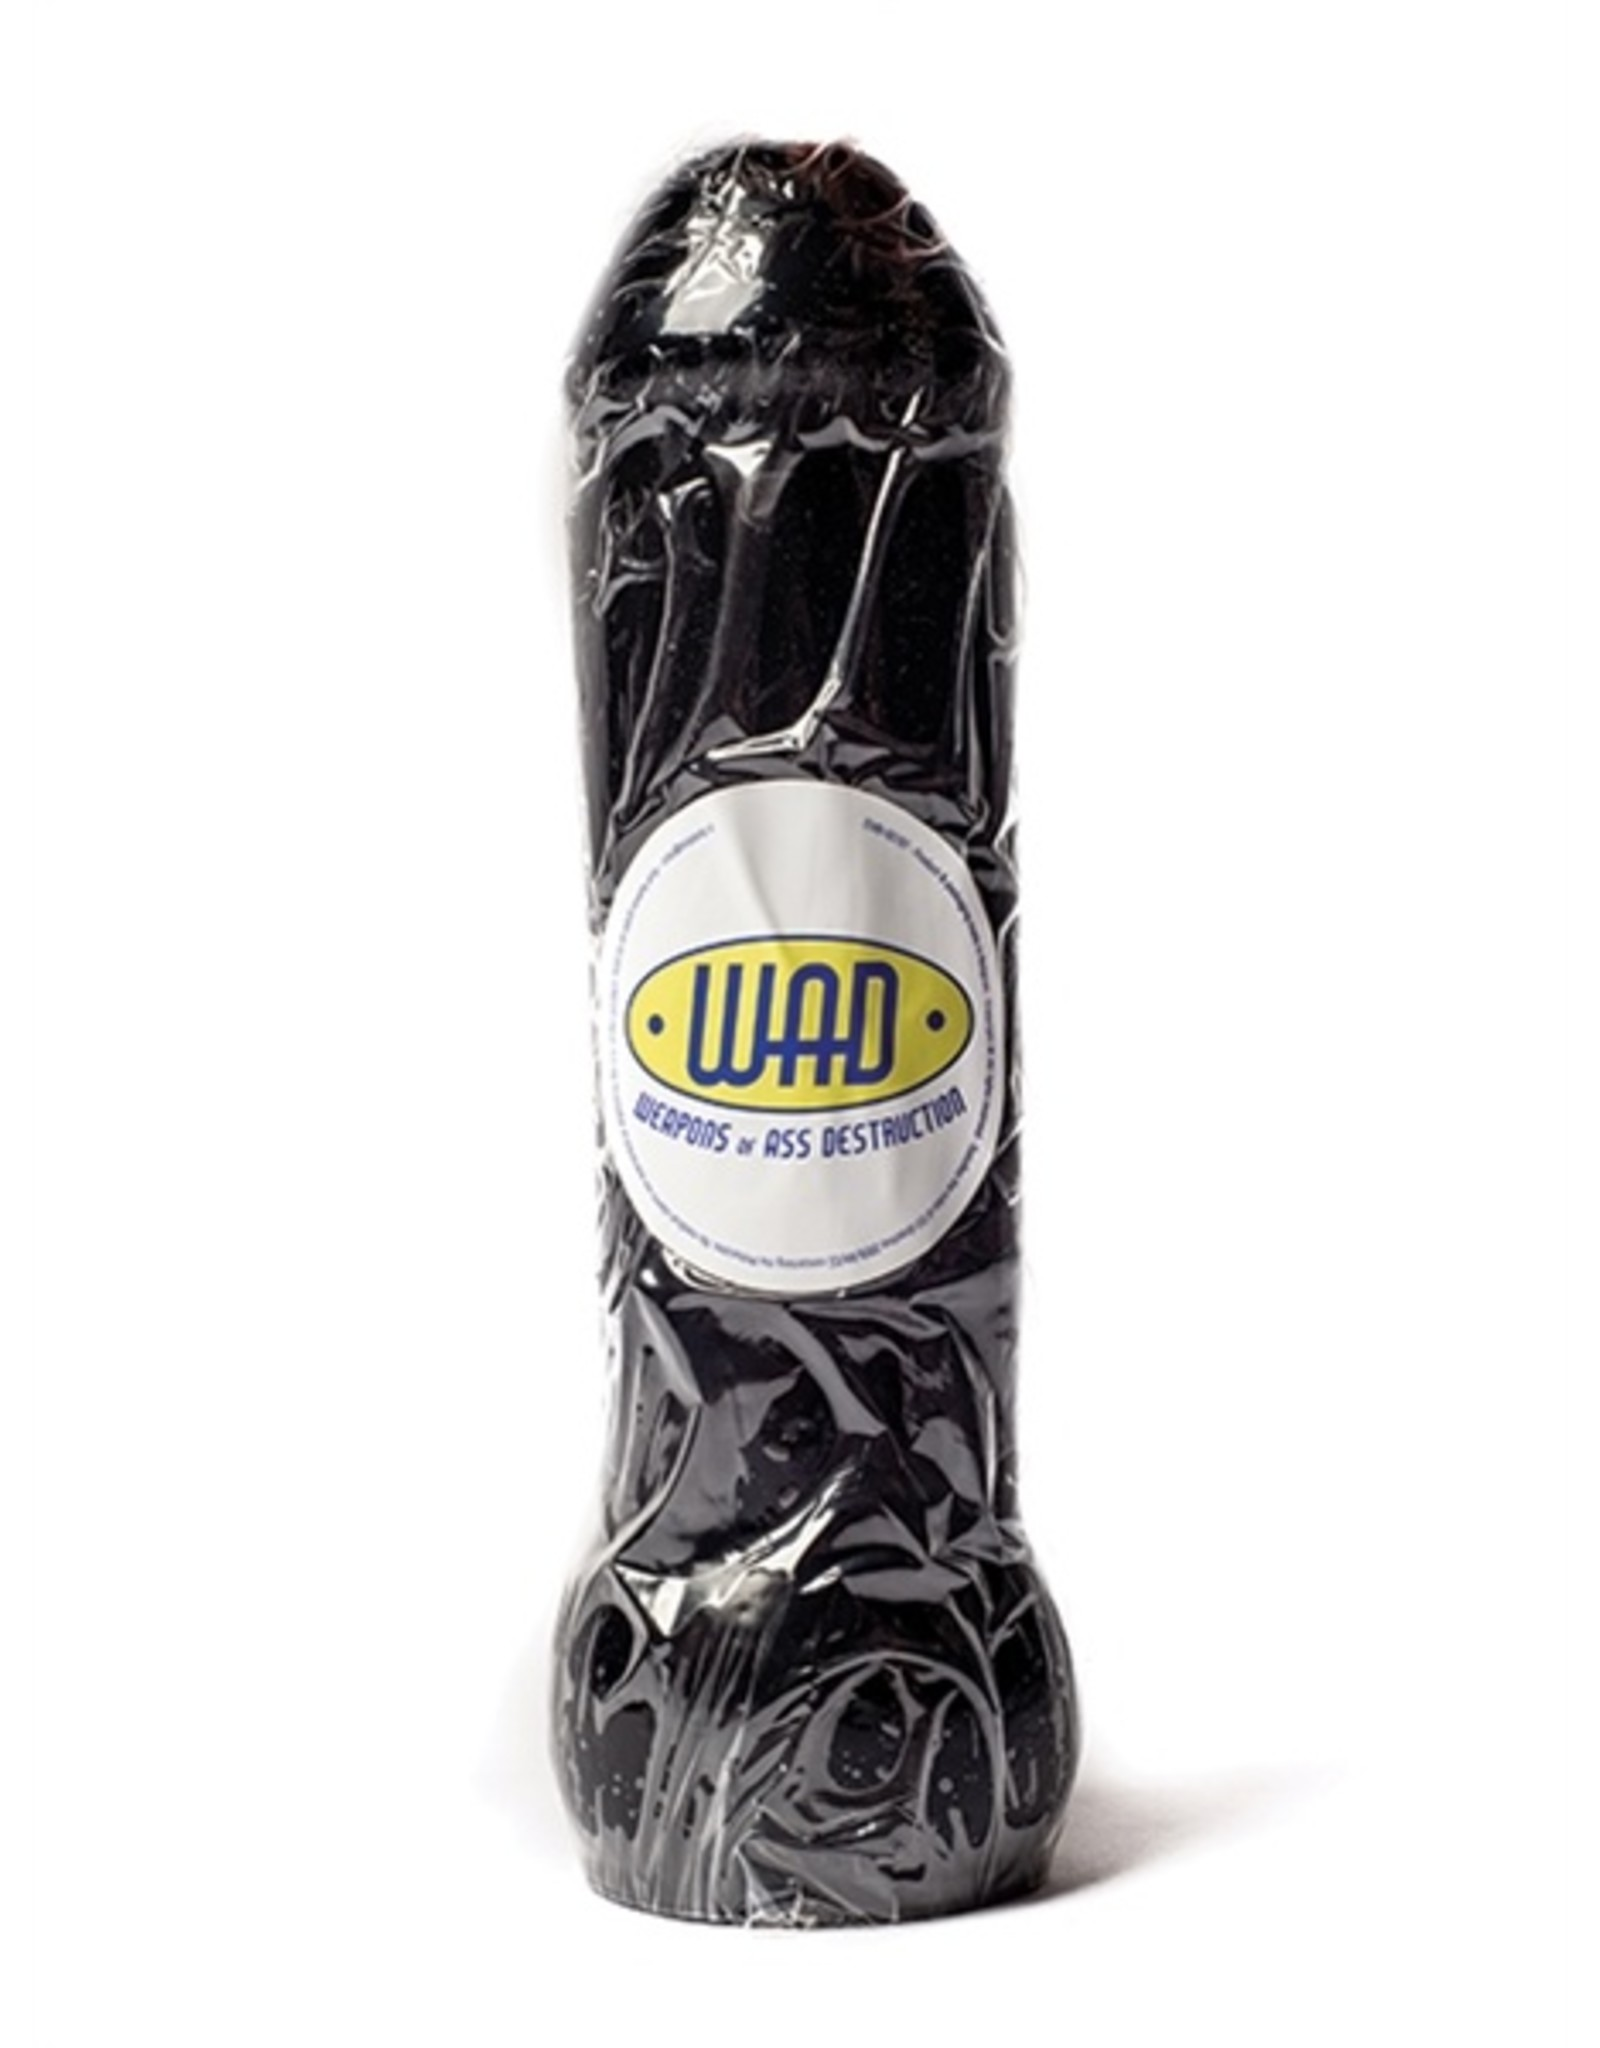 WAD - Weapons Of Ass Destruction WAD Dildo - Catalyst